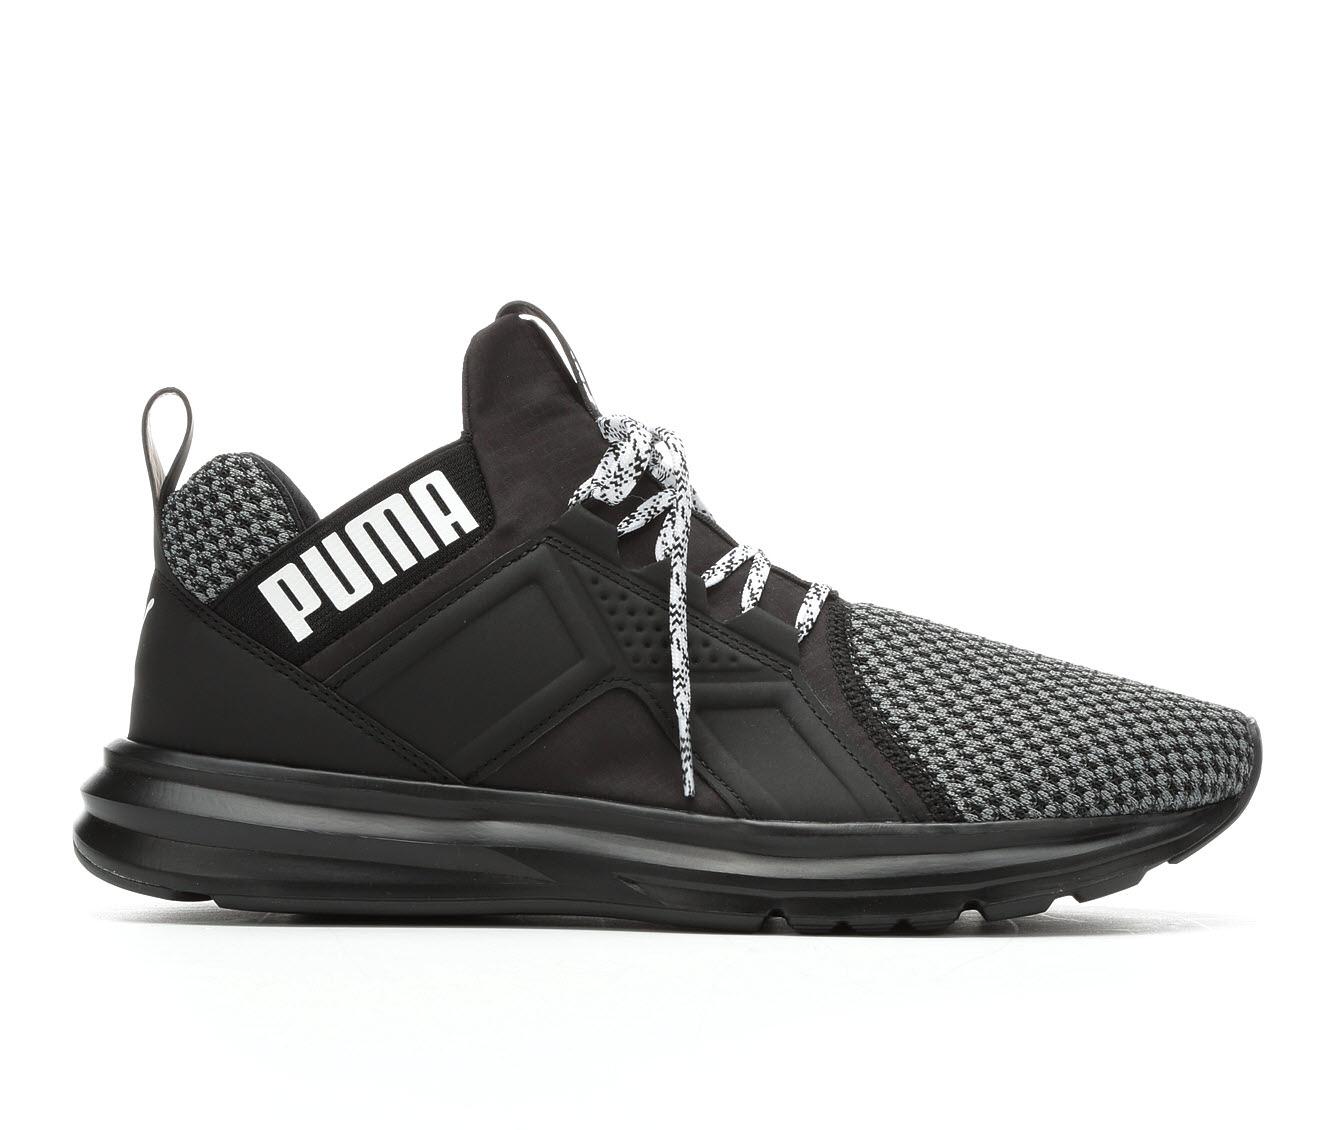 Men's Puma Enzo Terrain Sneakers (Black - Size 12) 1689665